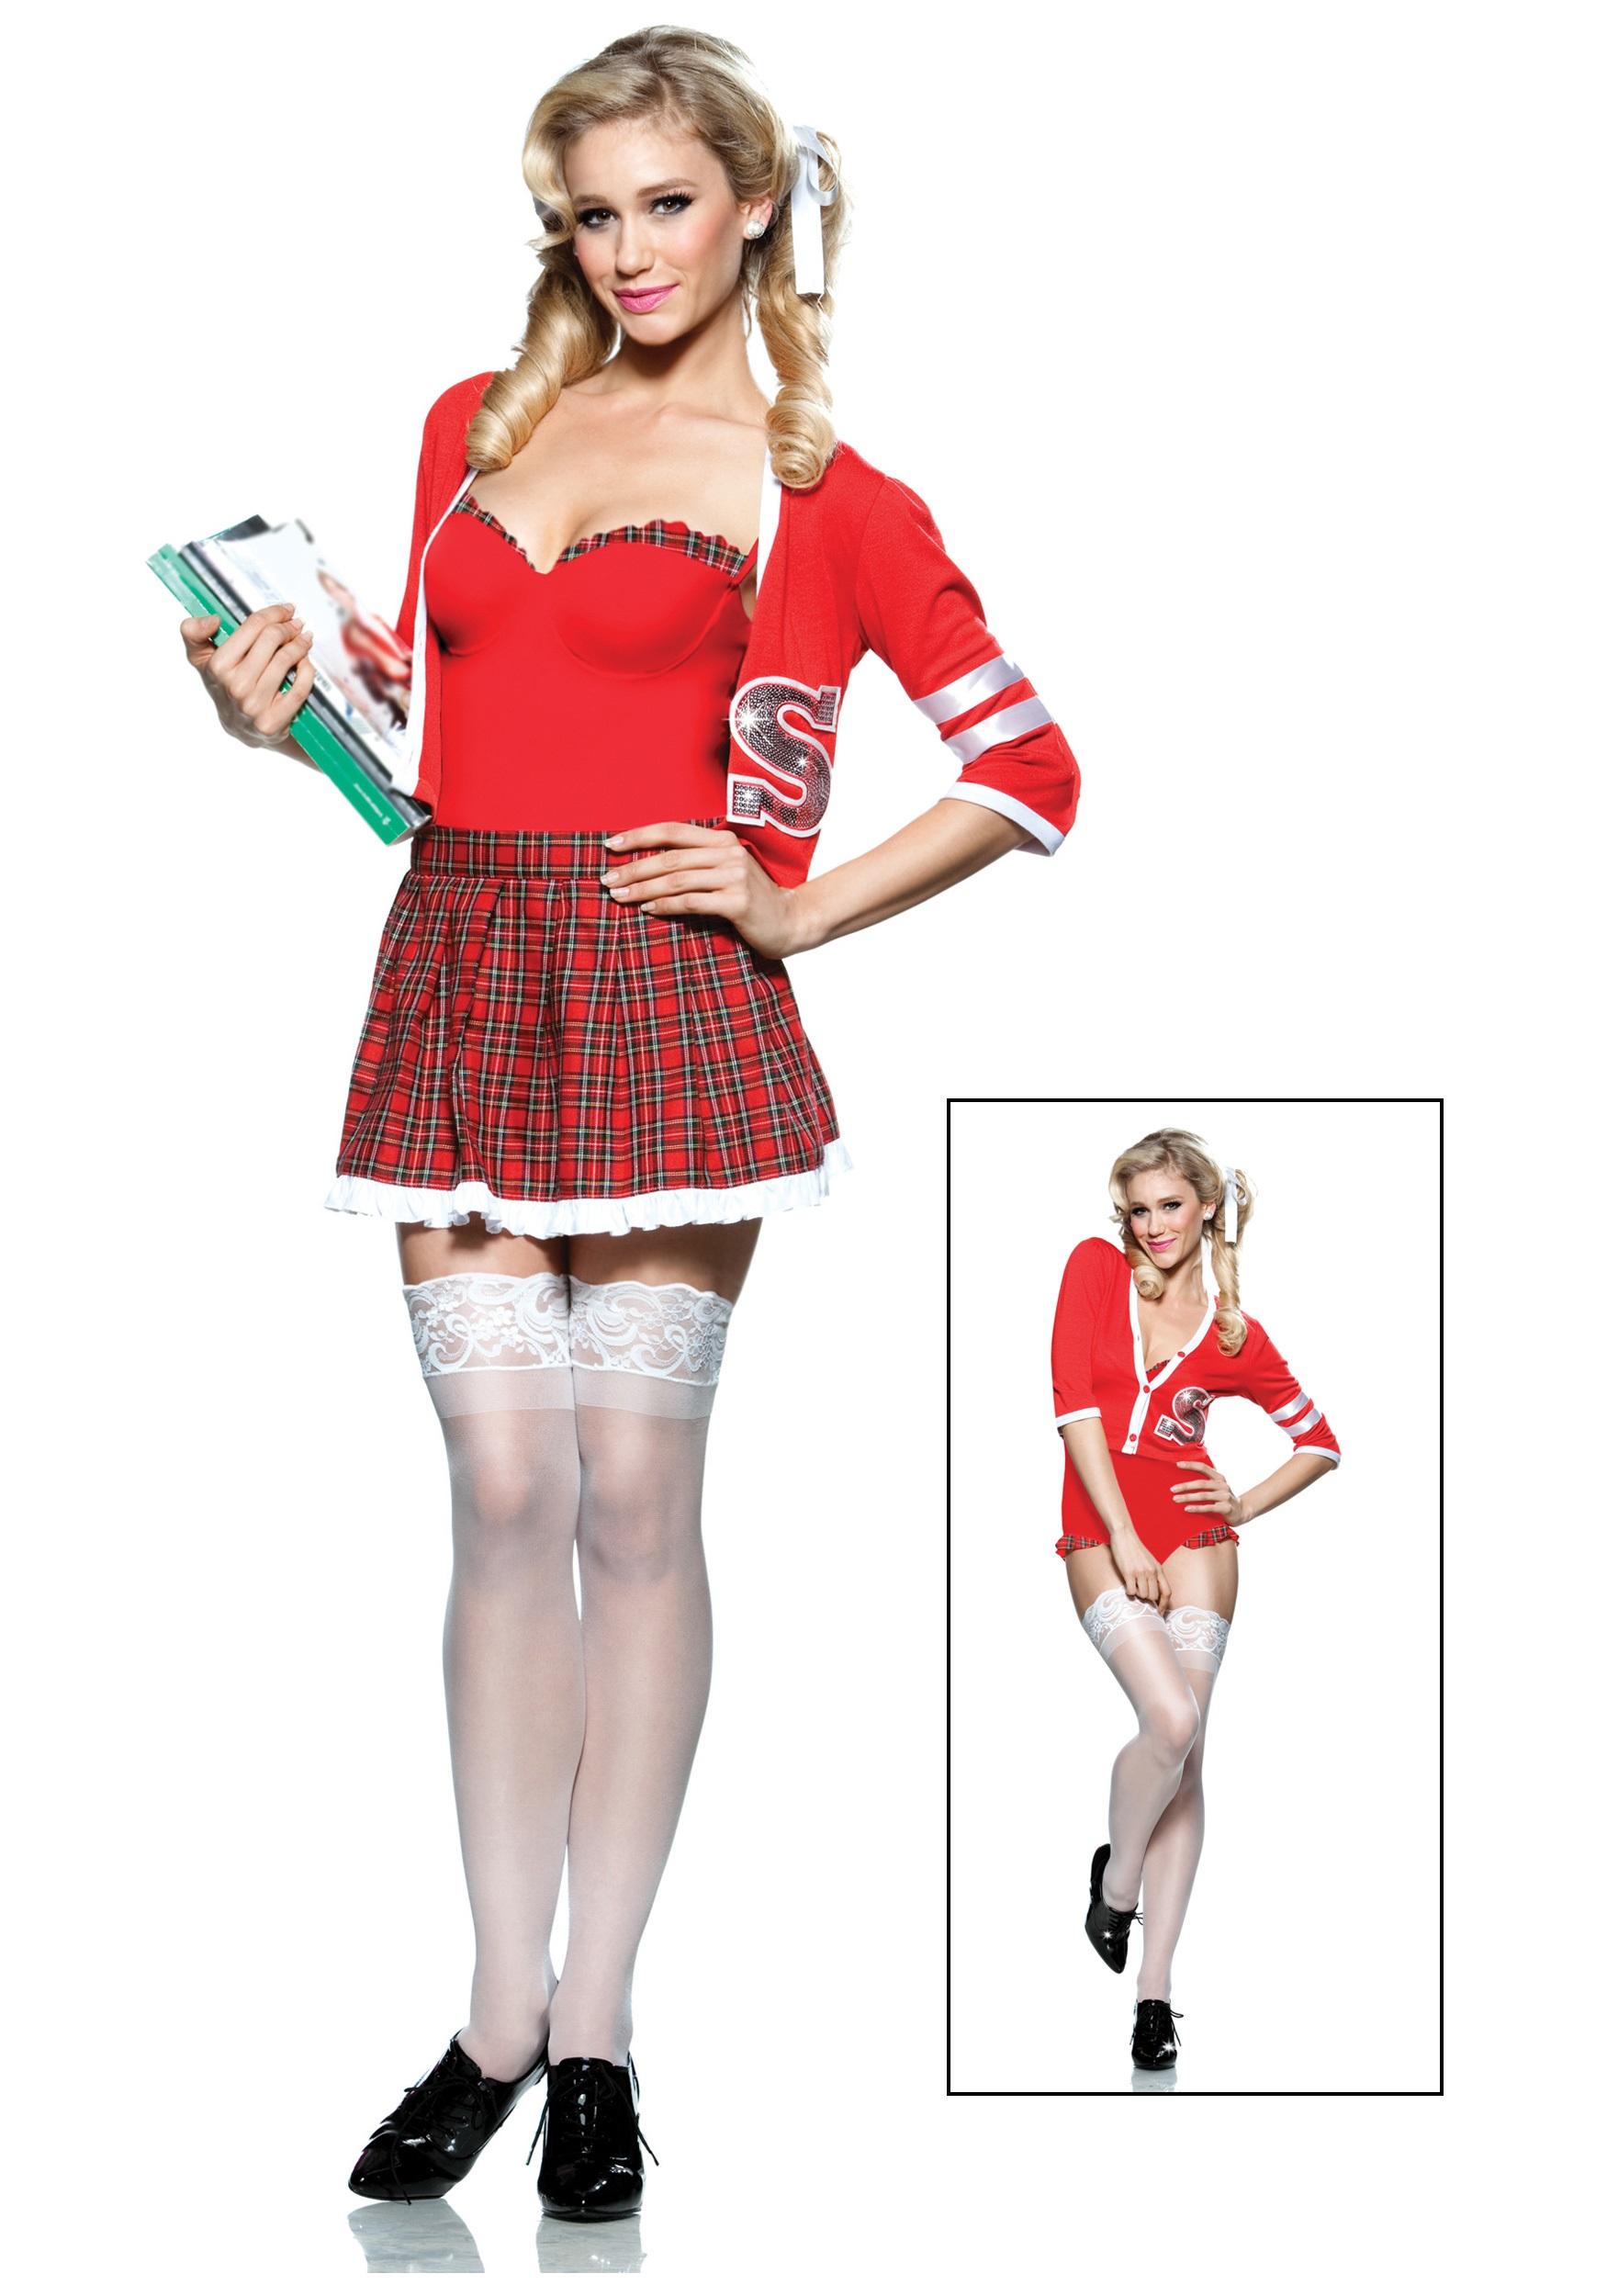 Varsity School Girl Costume  sc 1 st  Halloween Costumes & Varsity School Girl Costume - Halloween Costumes